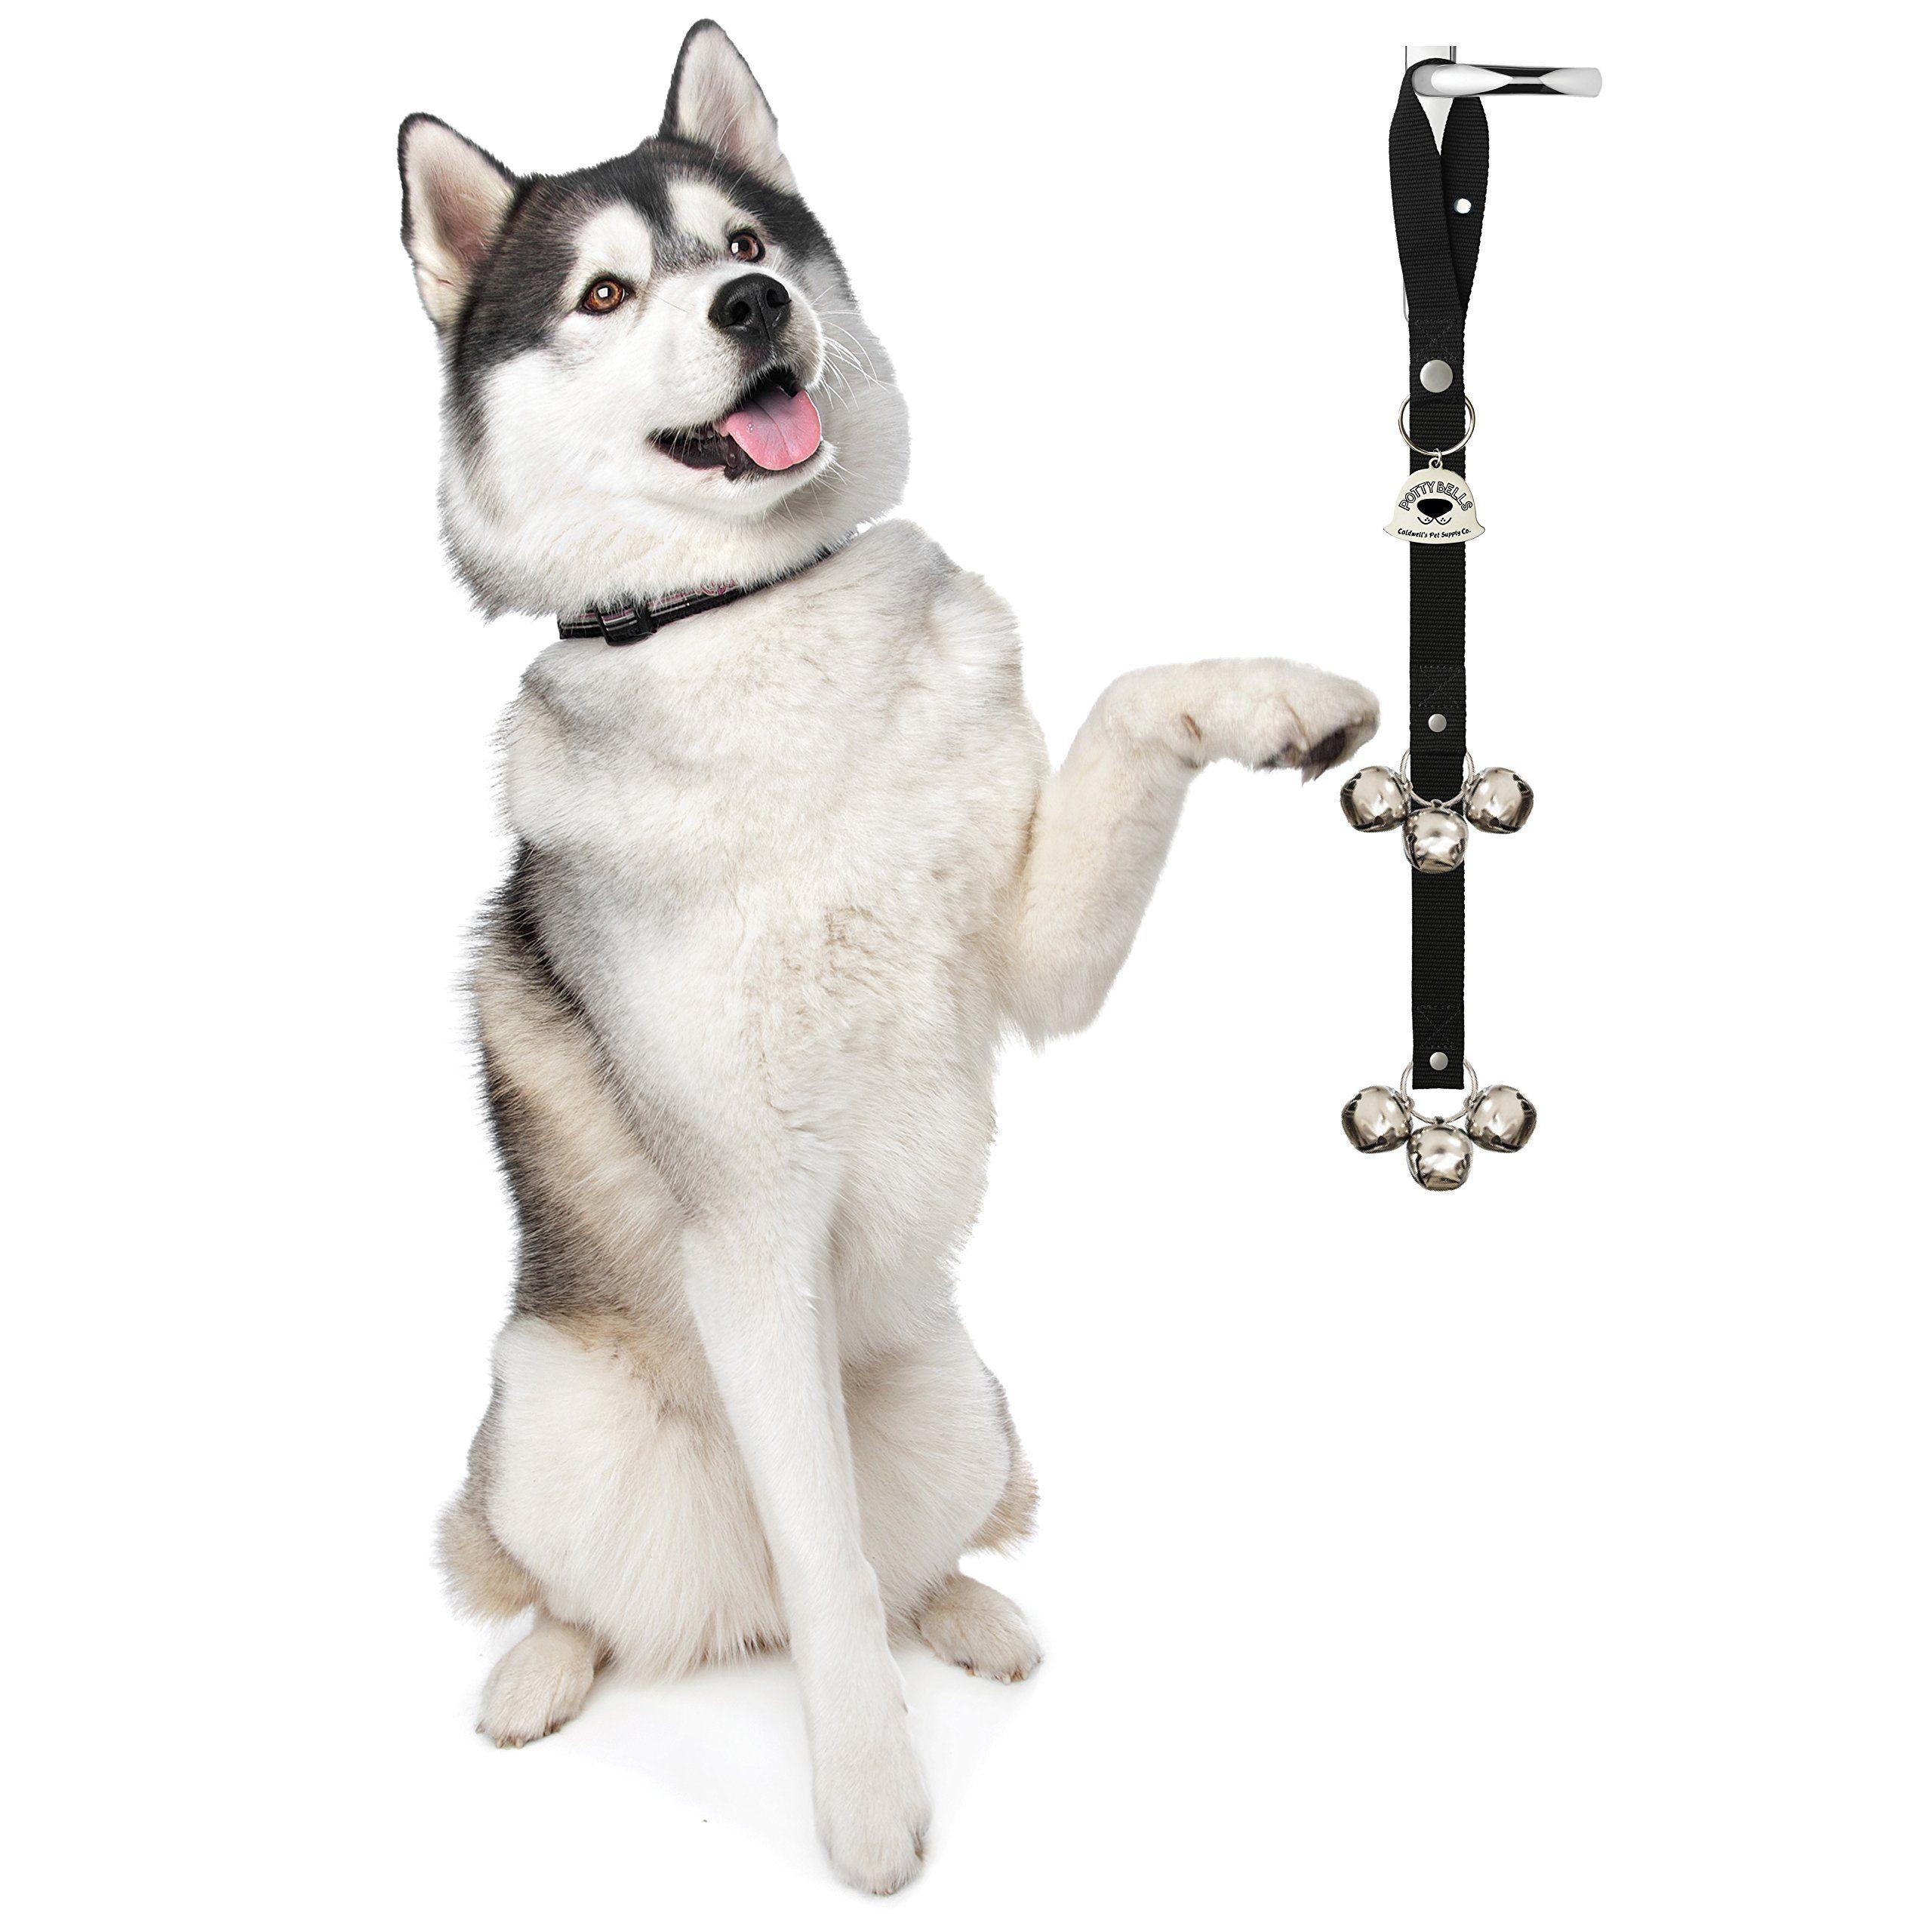 Potty Bells Housetraining Dog Doorbells For Dog Training And